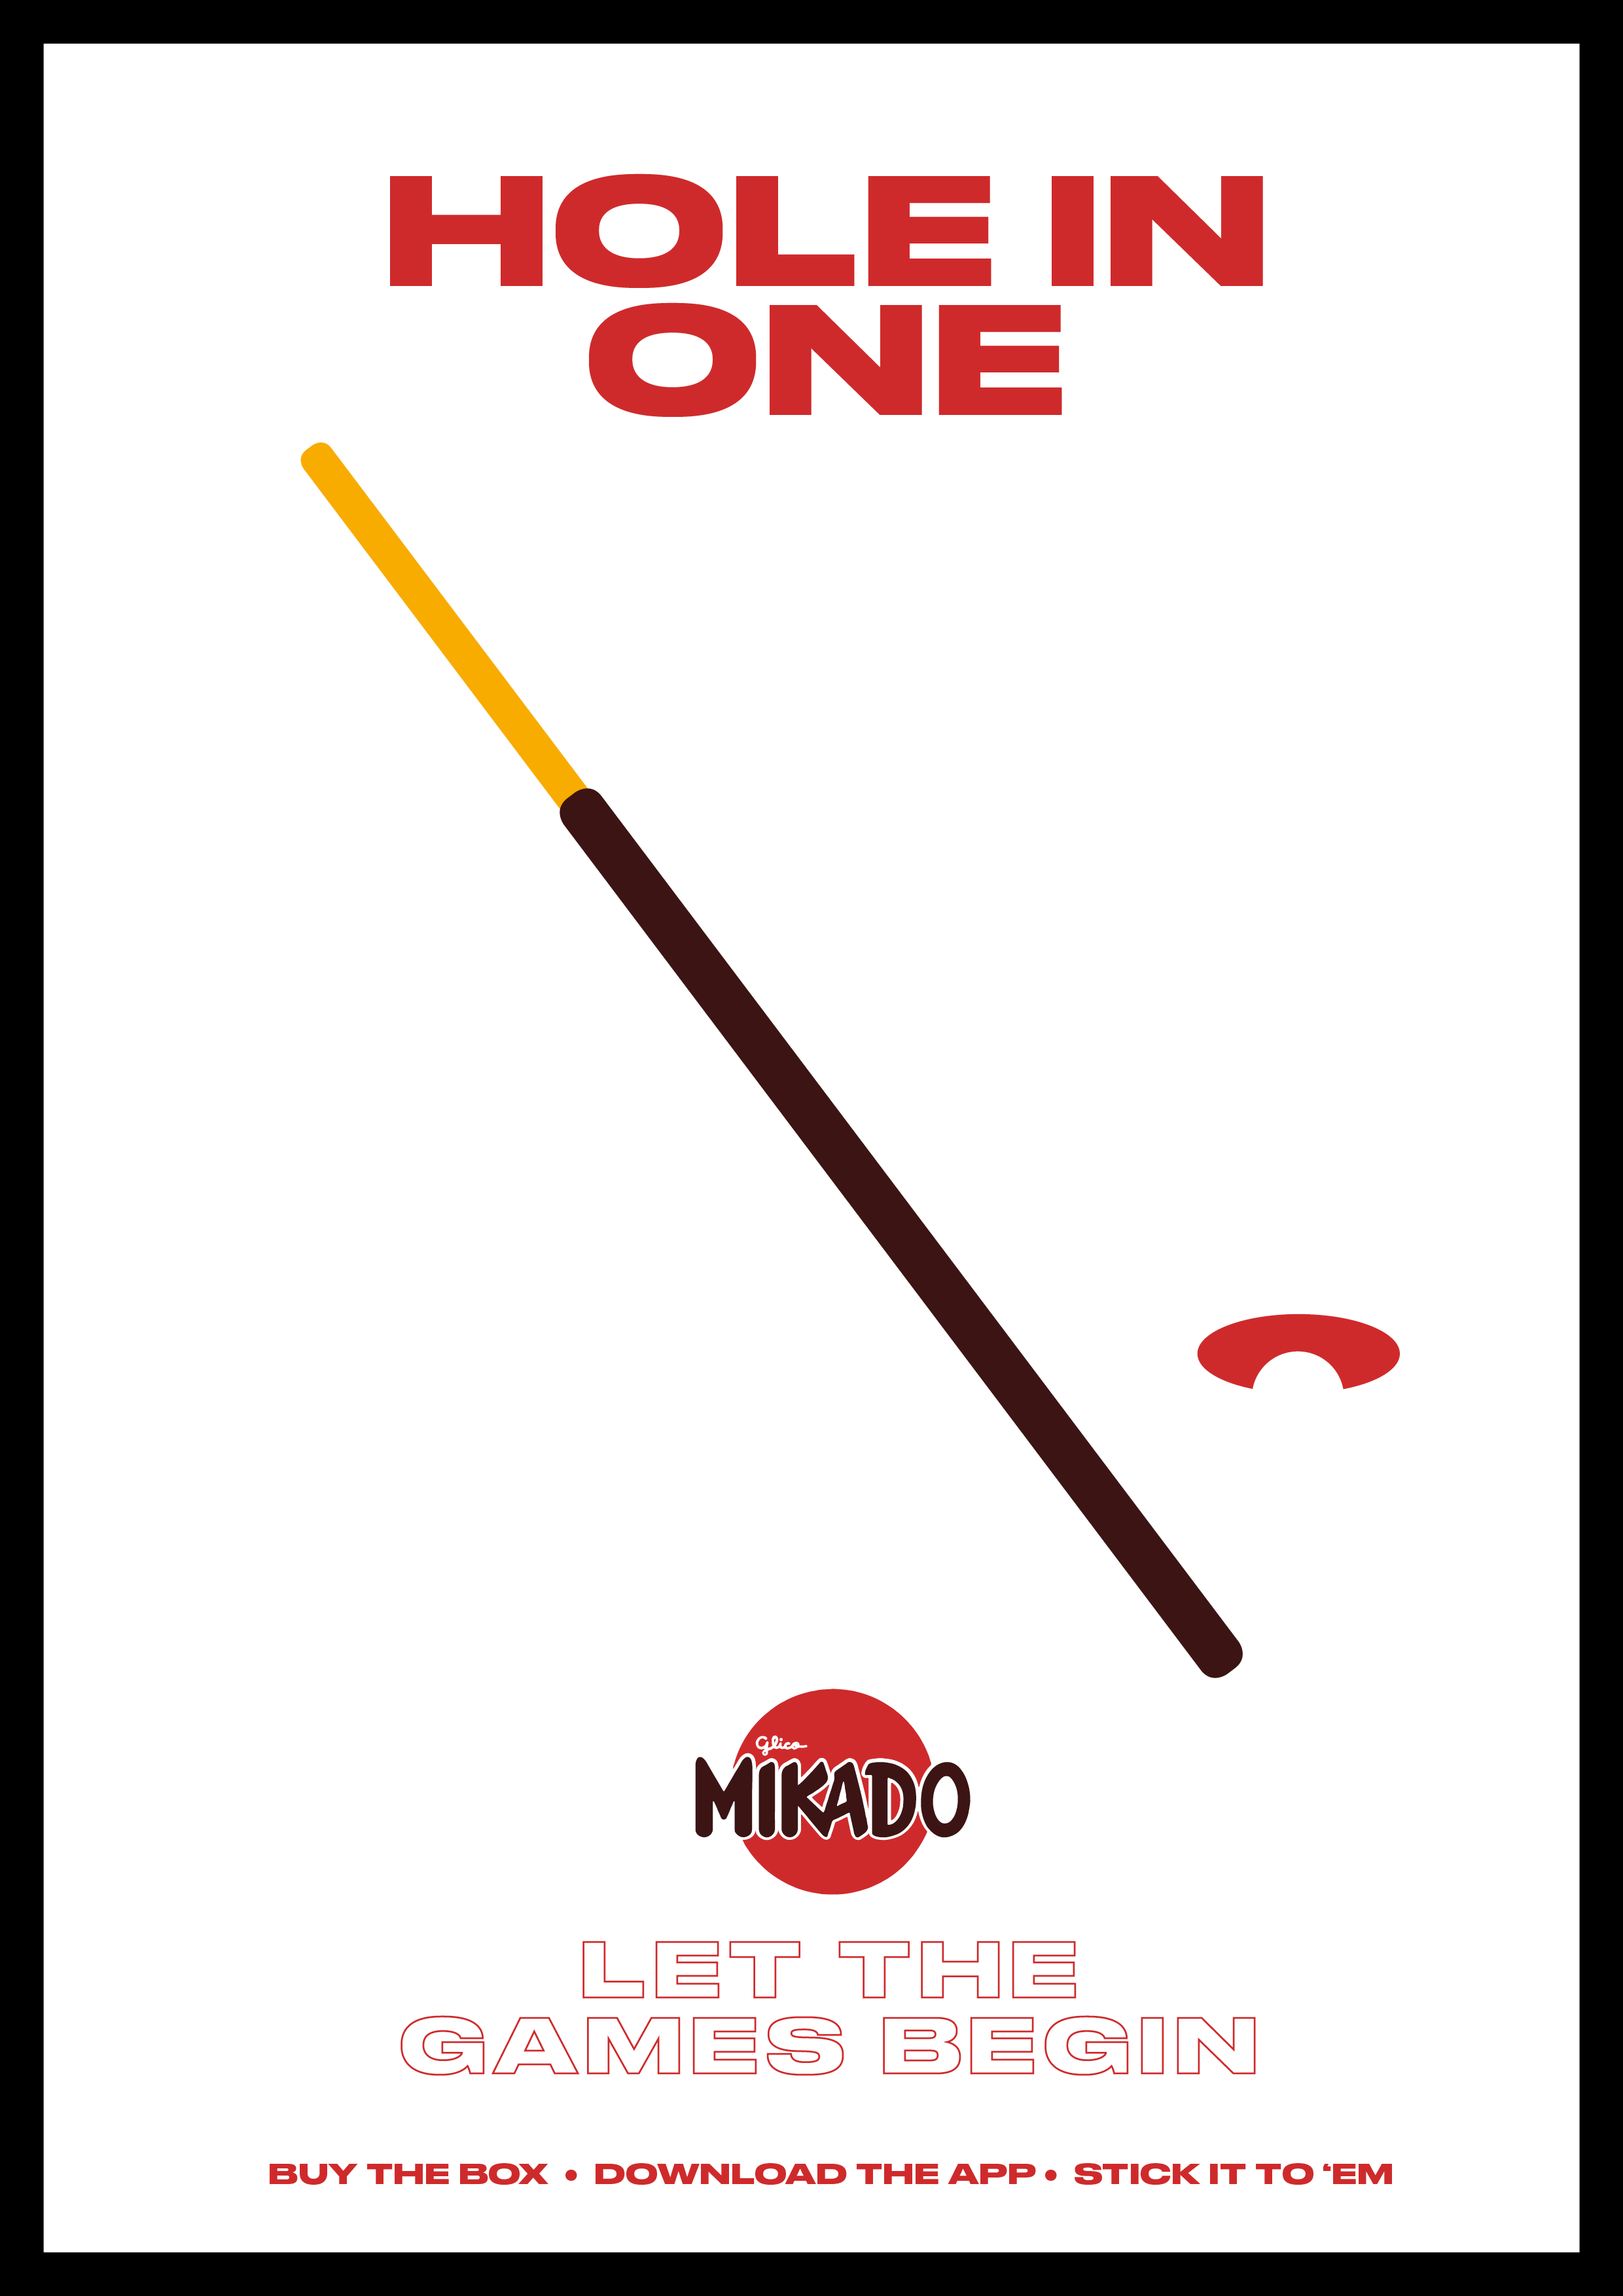 Mikado Poster 2.png